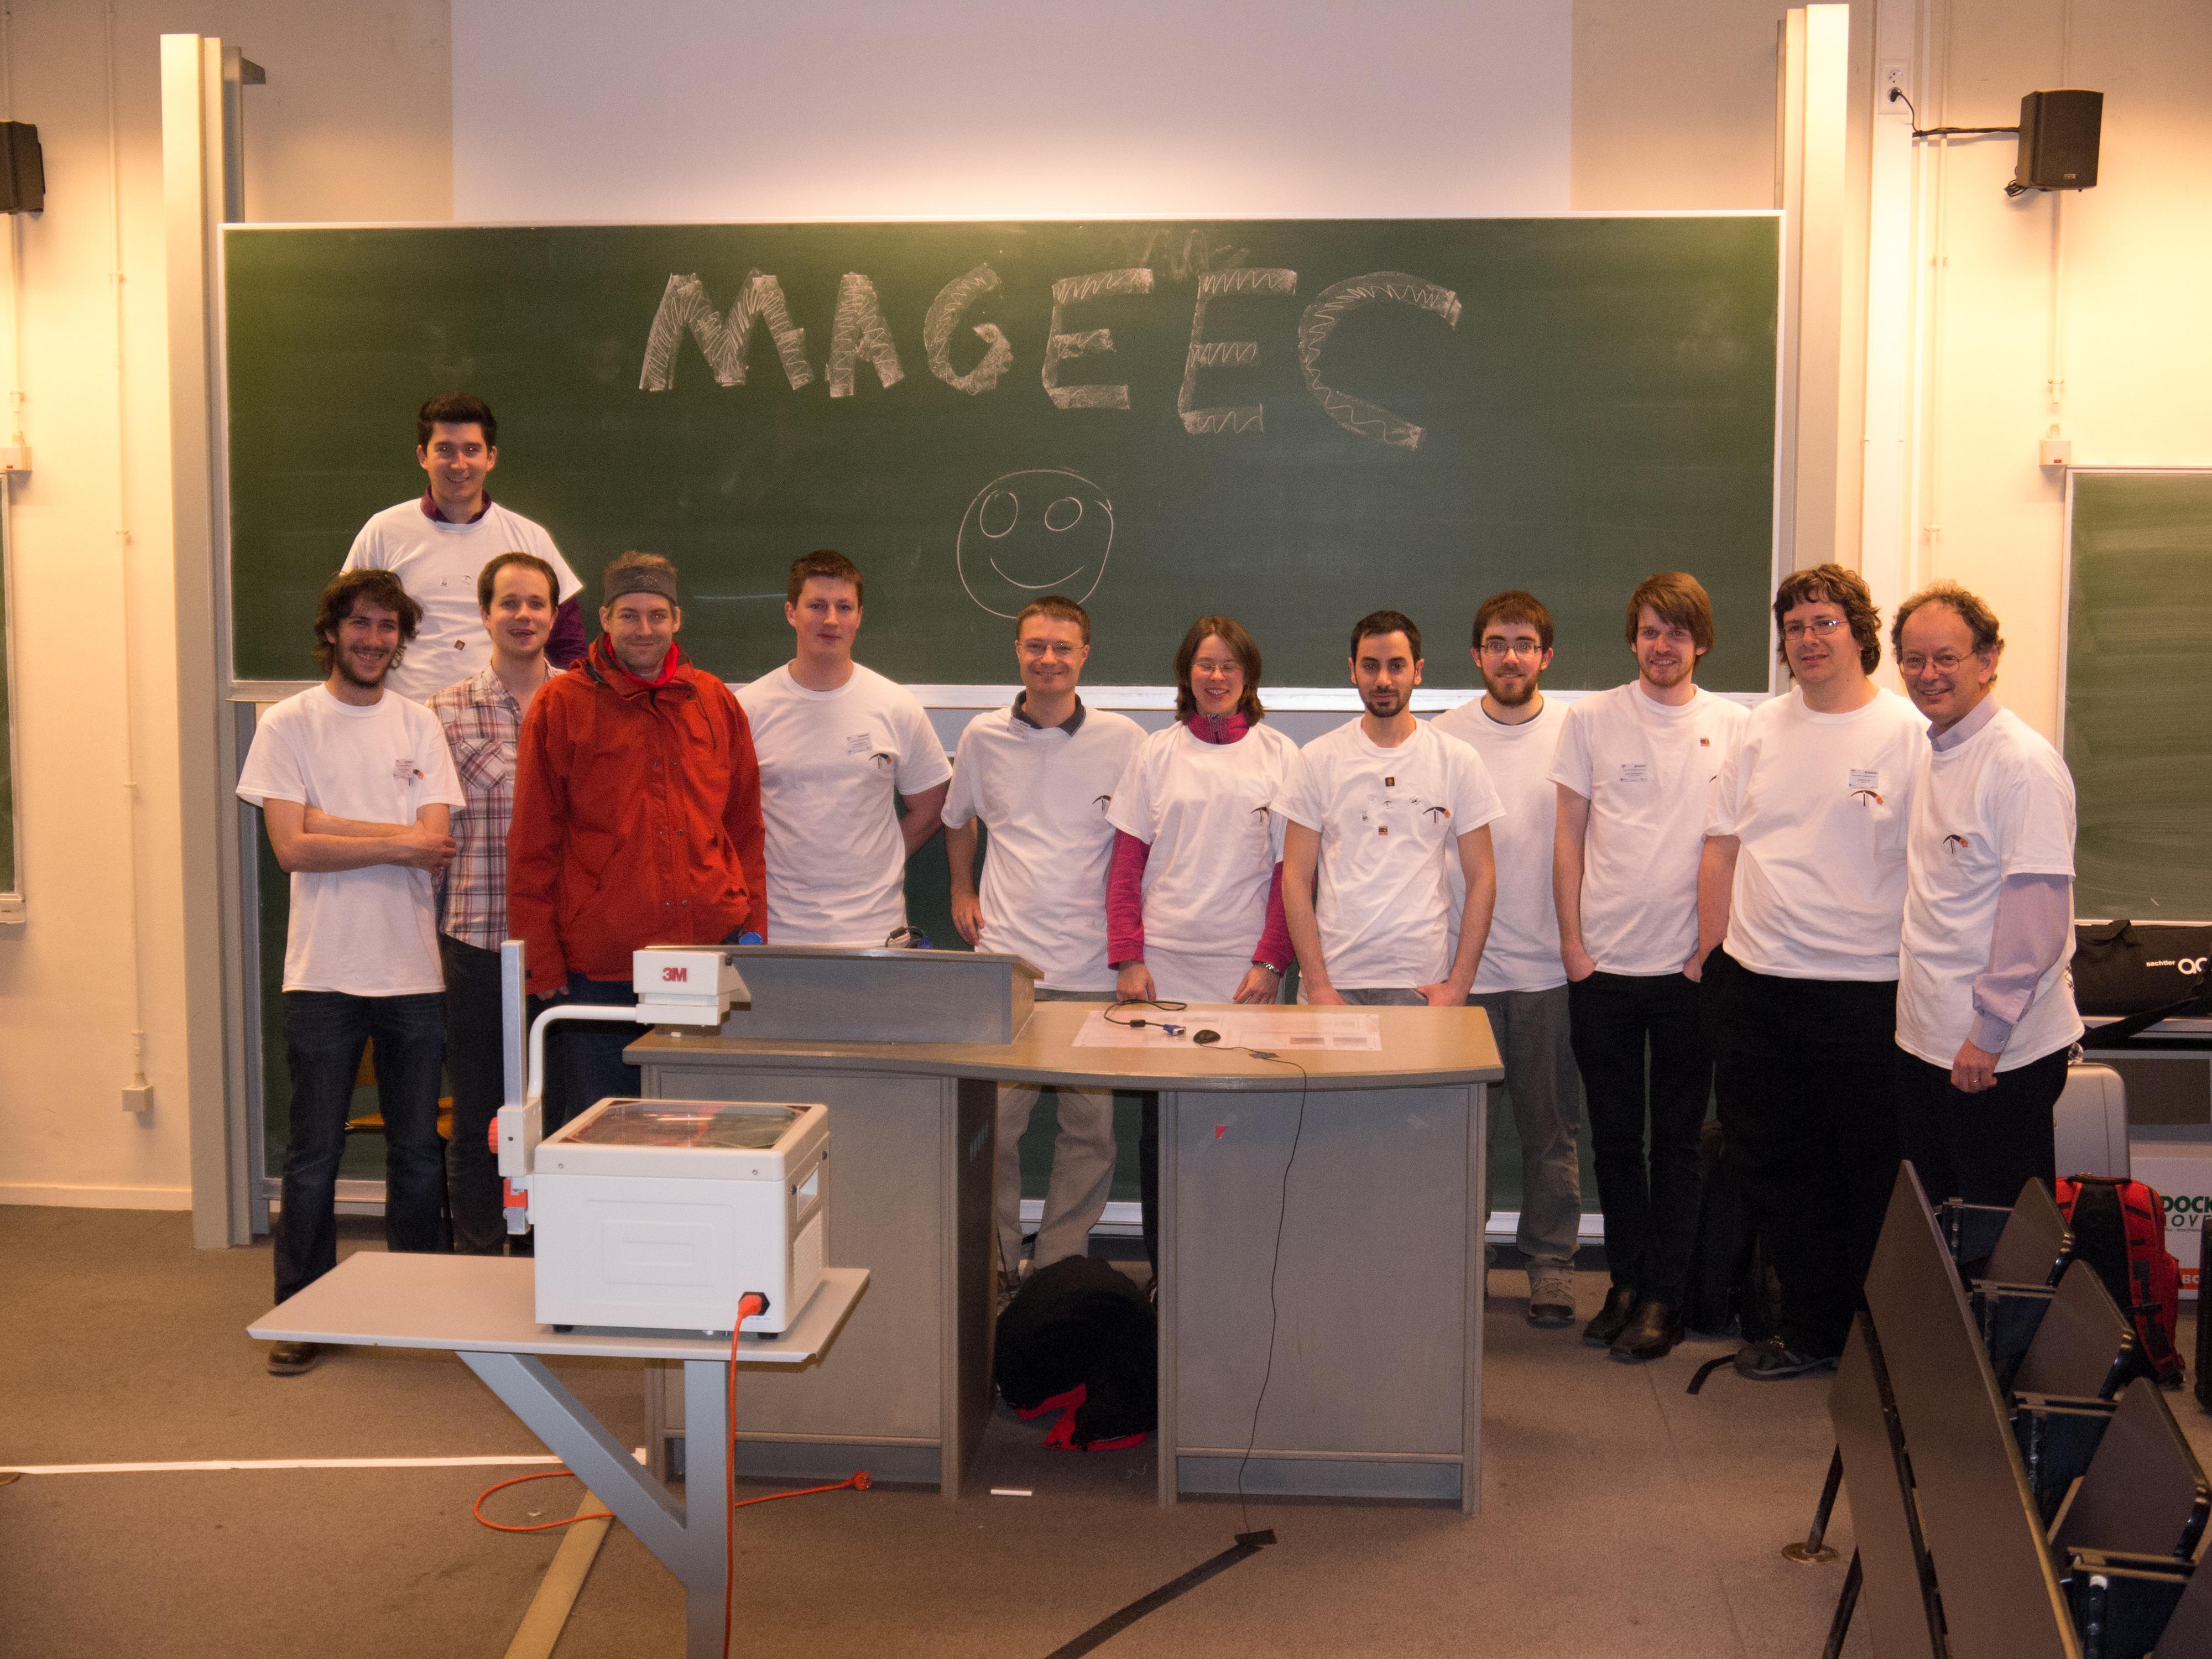 Team MAGEEC